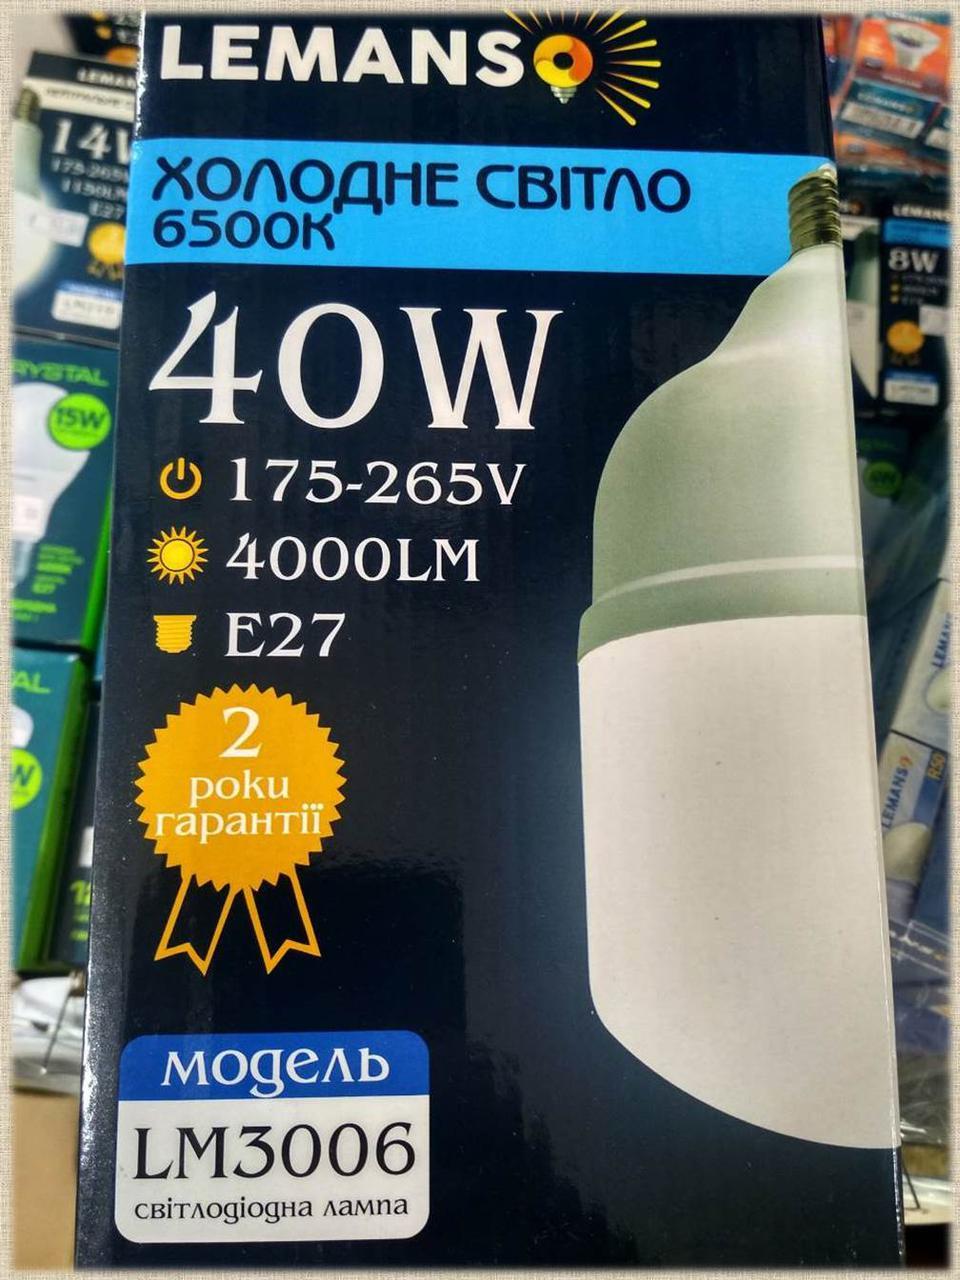 Светодиодная лампа 40W 4000Lm E27 Lemanso LM3006 6000К